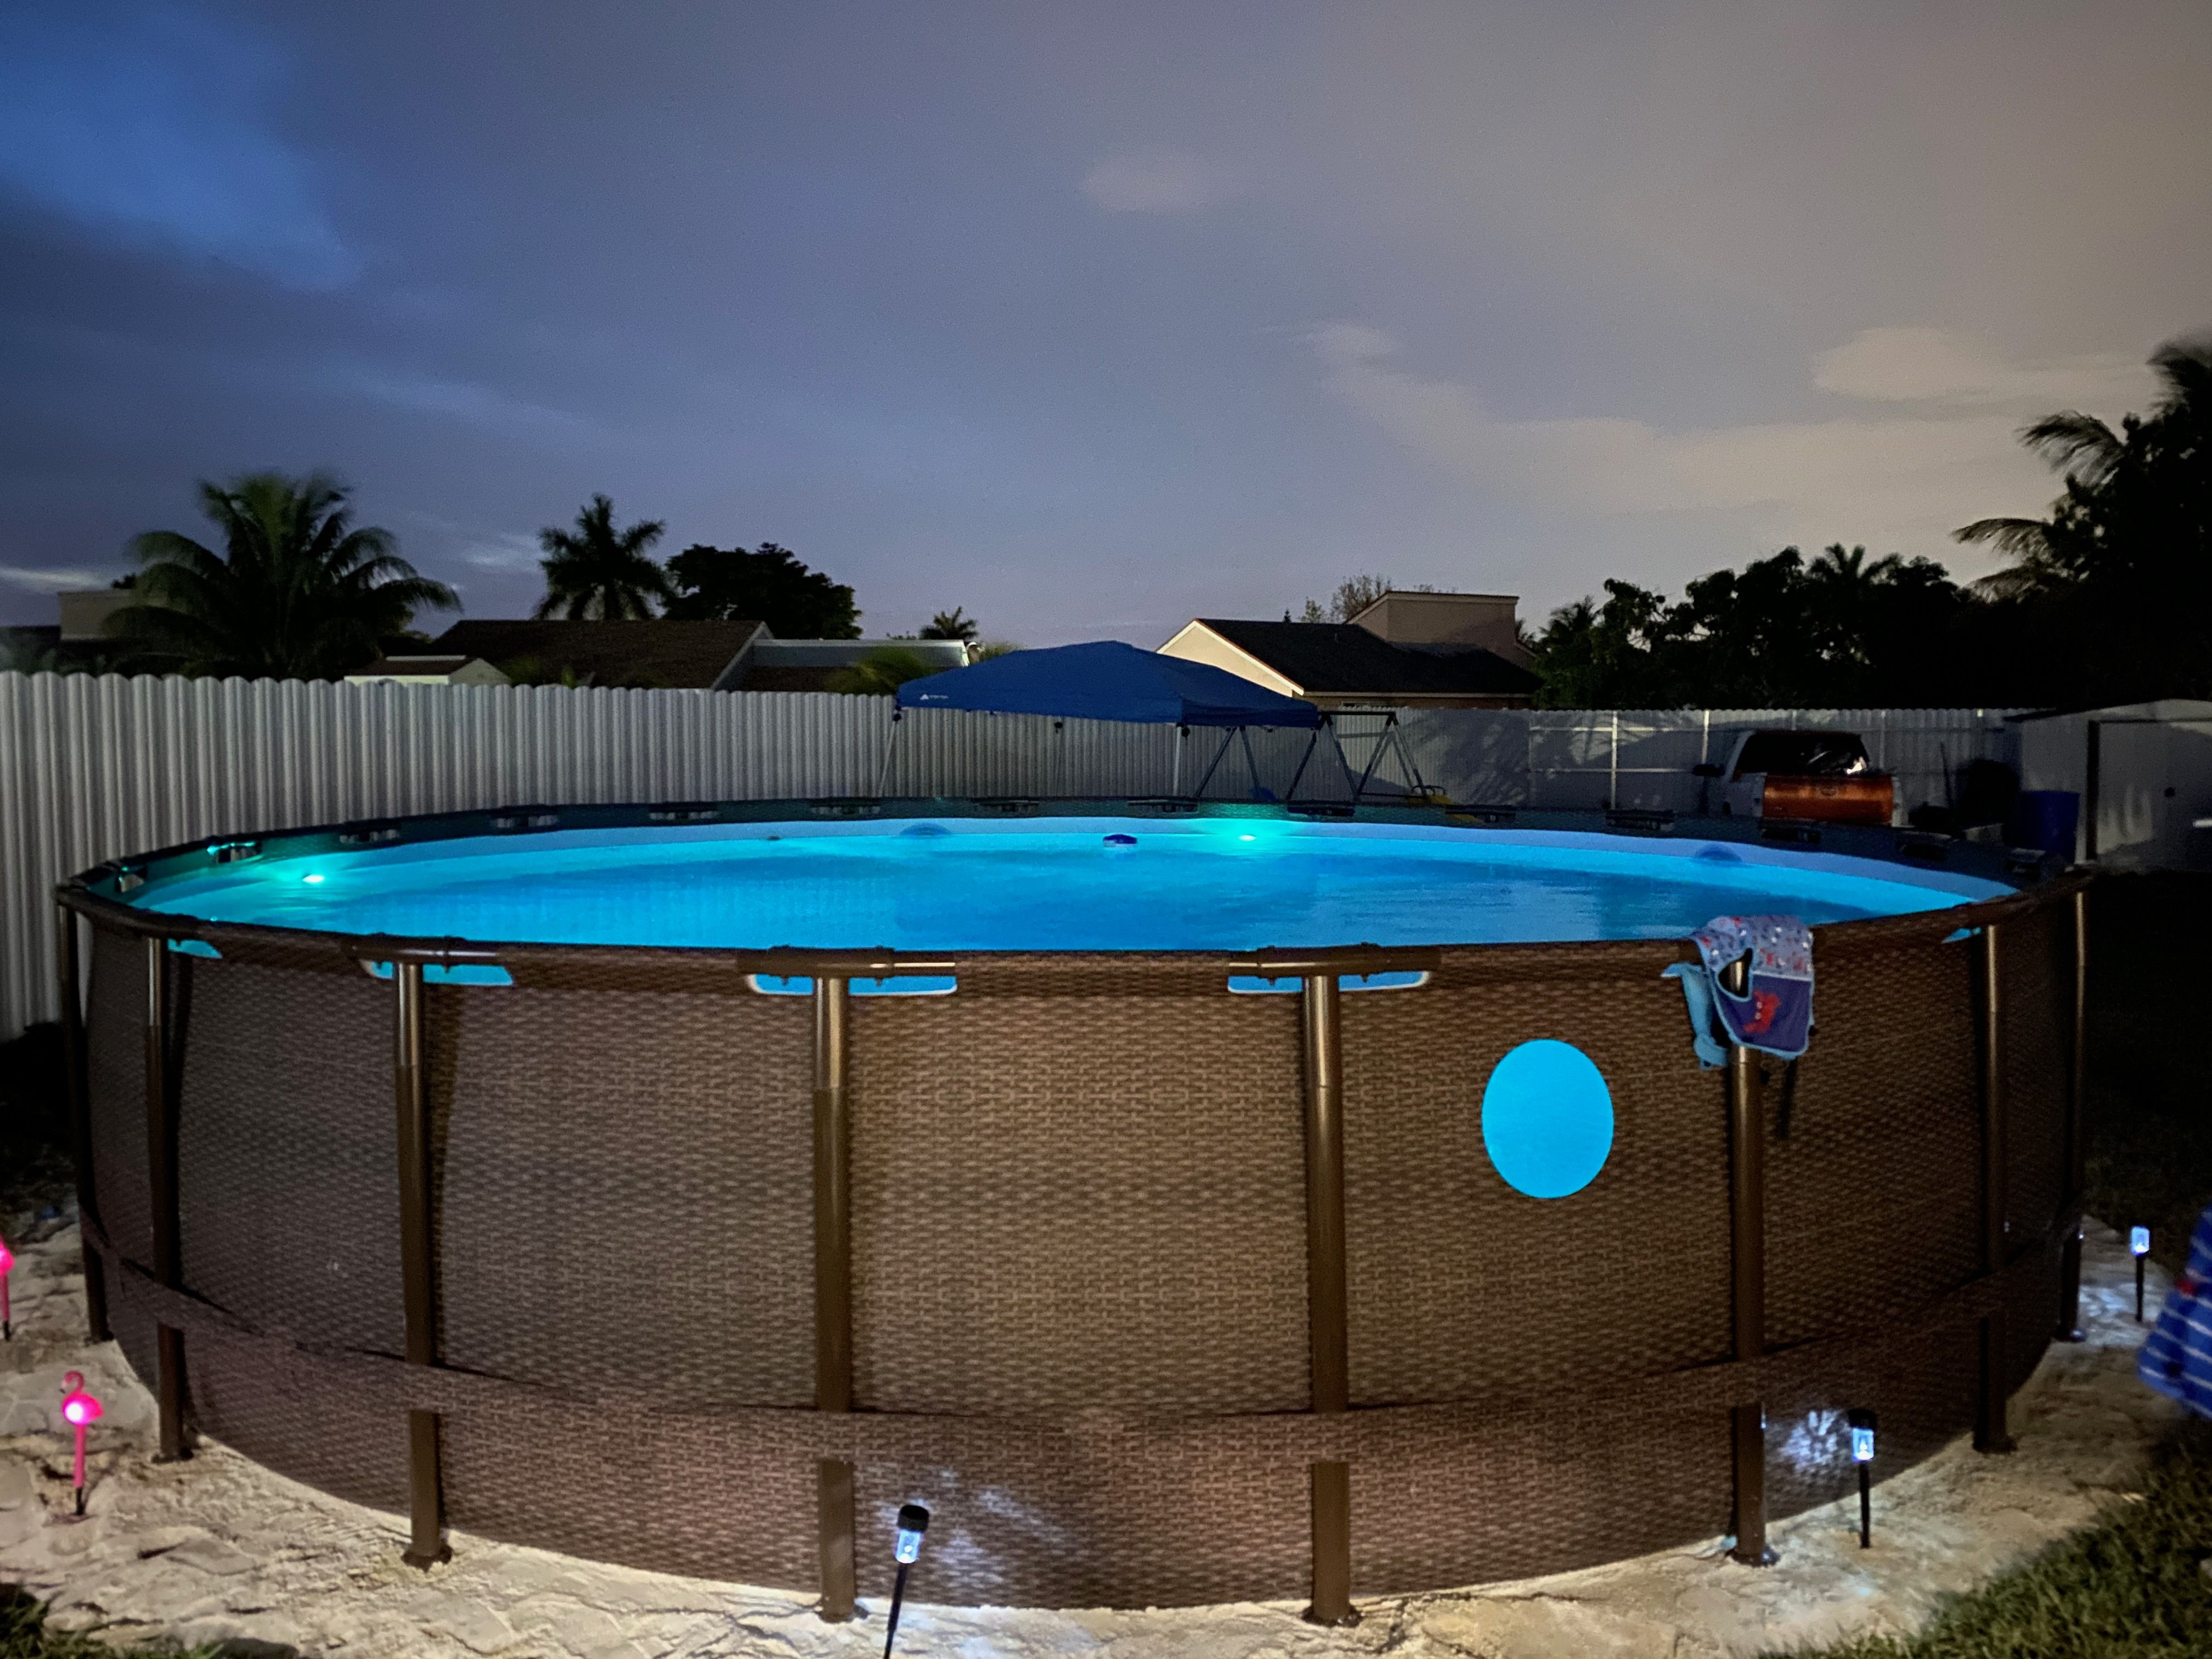 Above Ground Pool Outdoor Pool Area Backyard Pool Coleman Pool